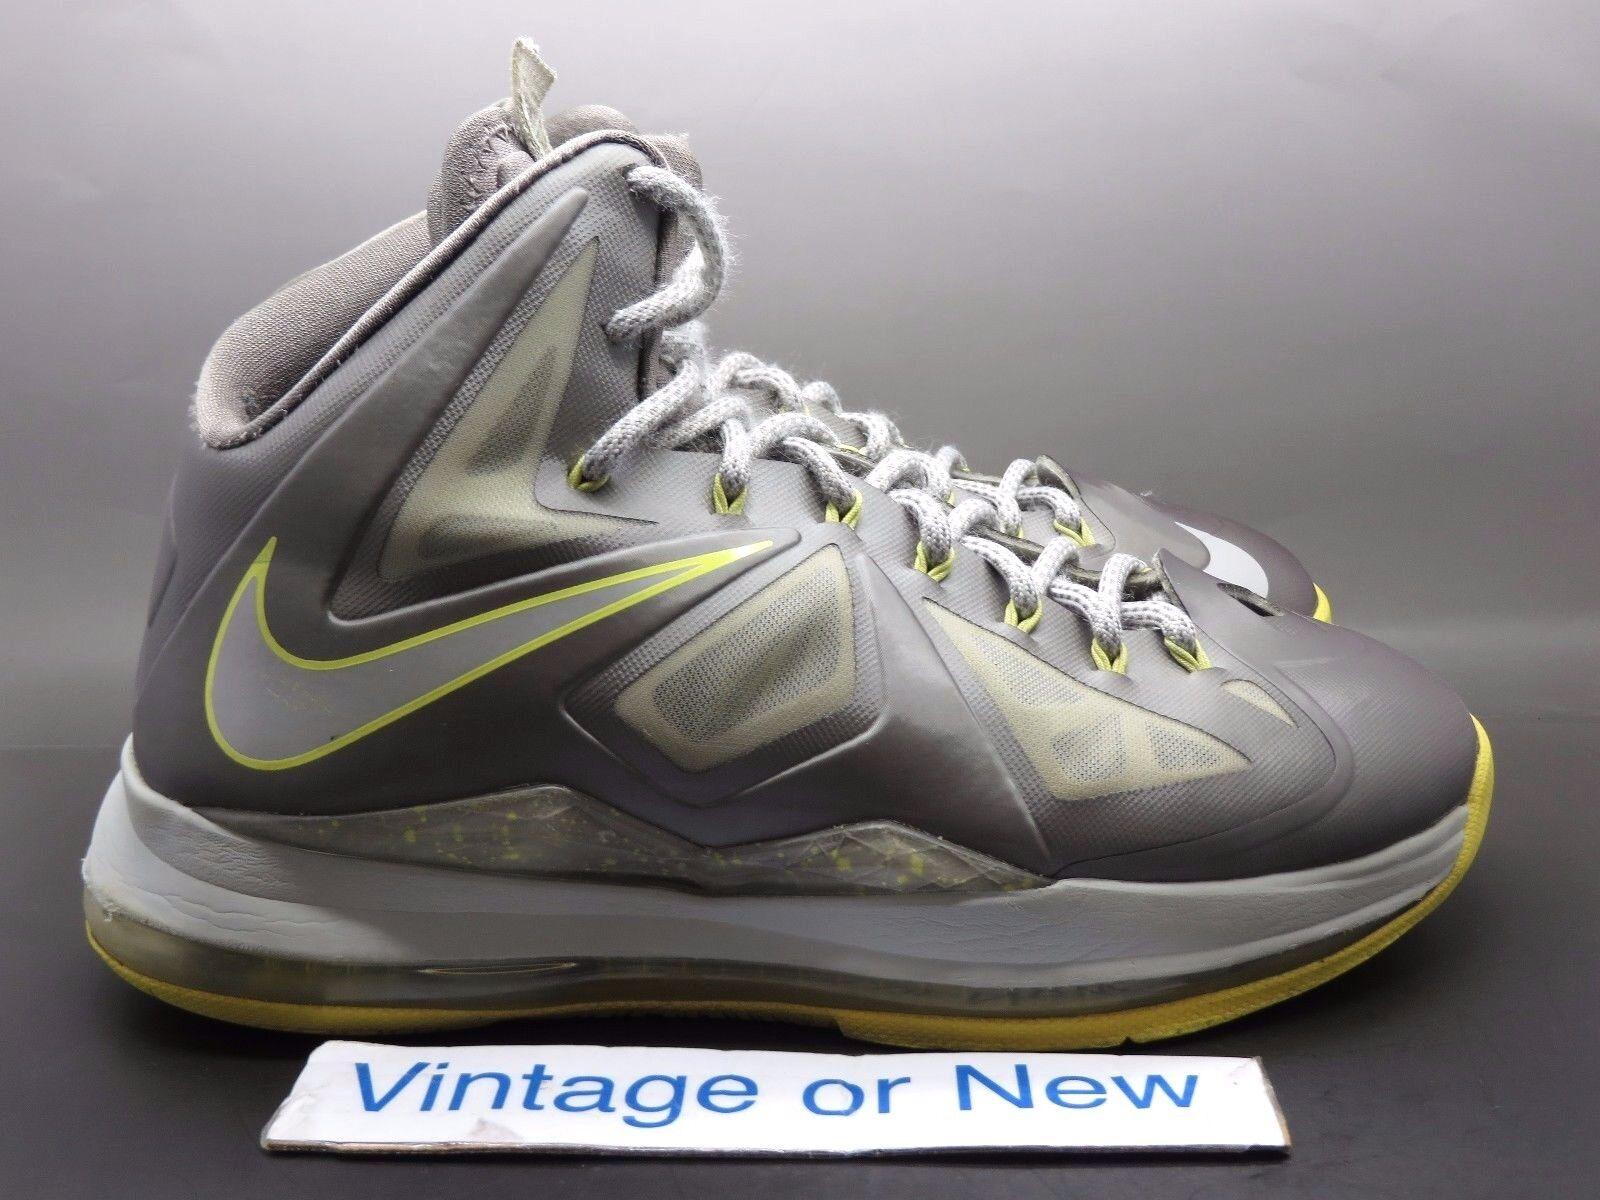 Nike lebron x - 10 diamante canary sz - x 8 87fb7a